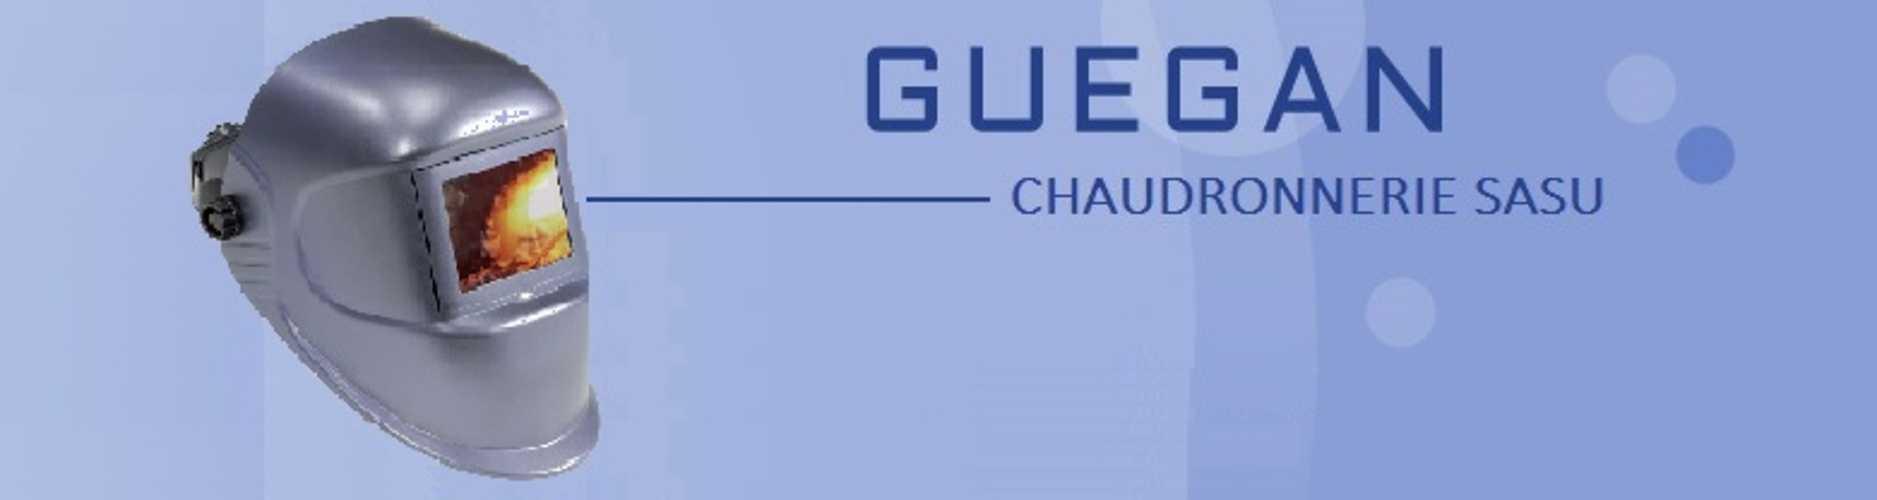 GUEGAN CHAUDRONNERIE 0